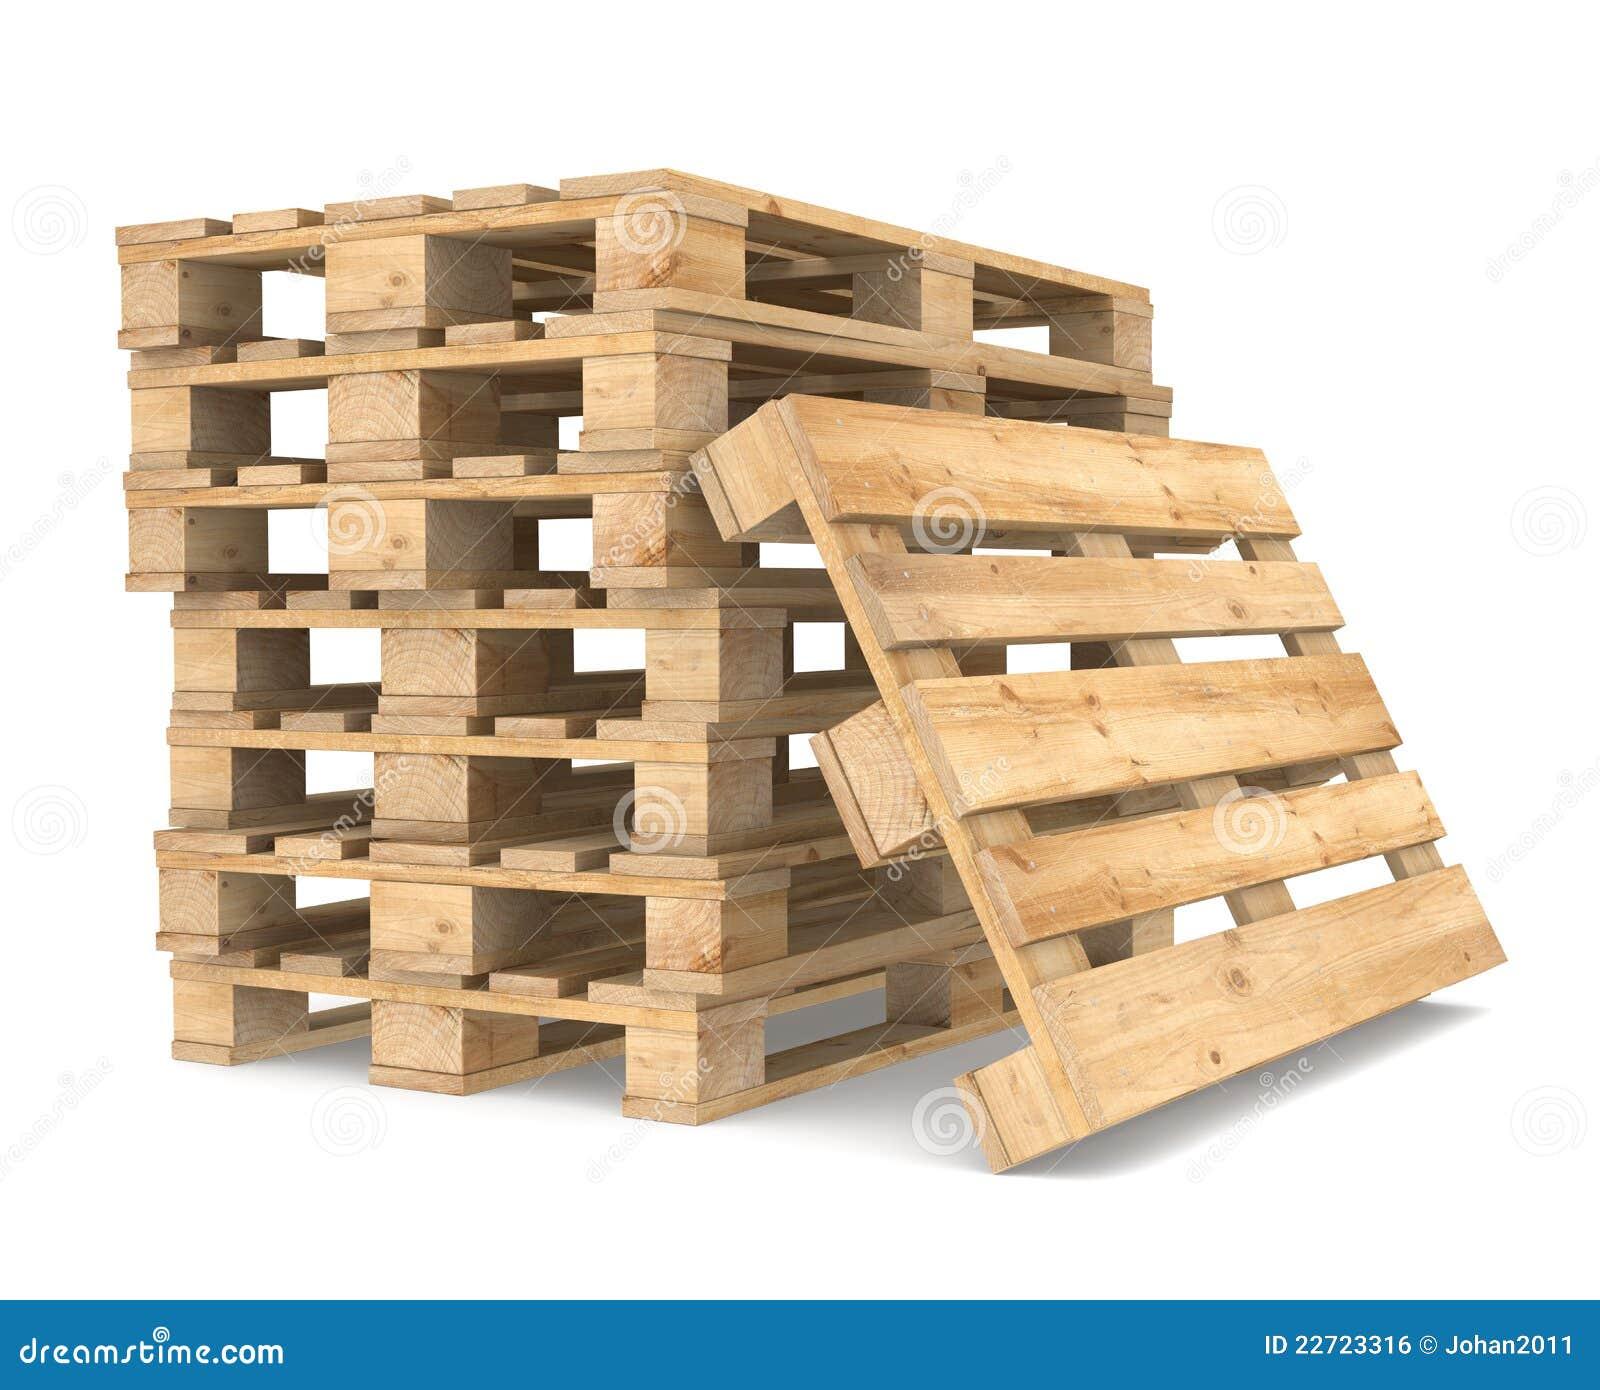 Pallets Wooden Pallets Stock Illustrations 393 Wooden Pallets Stock